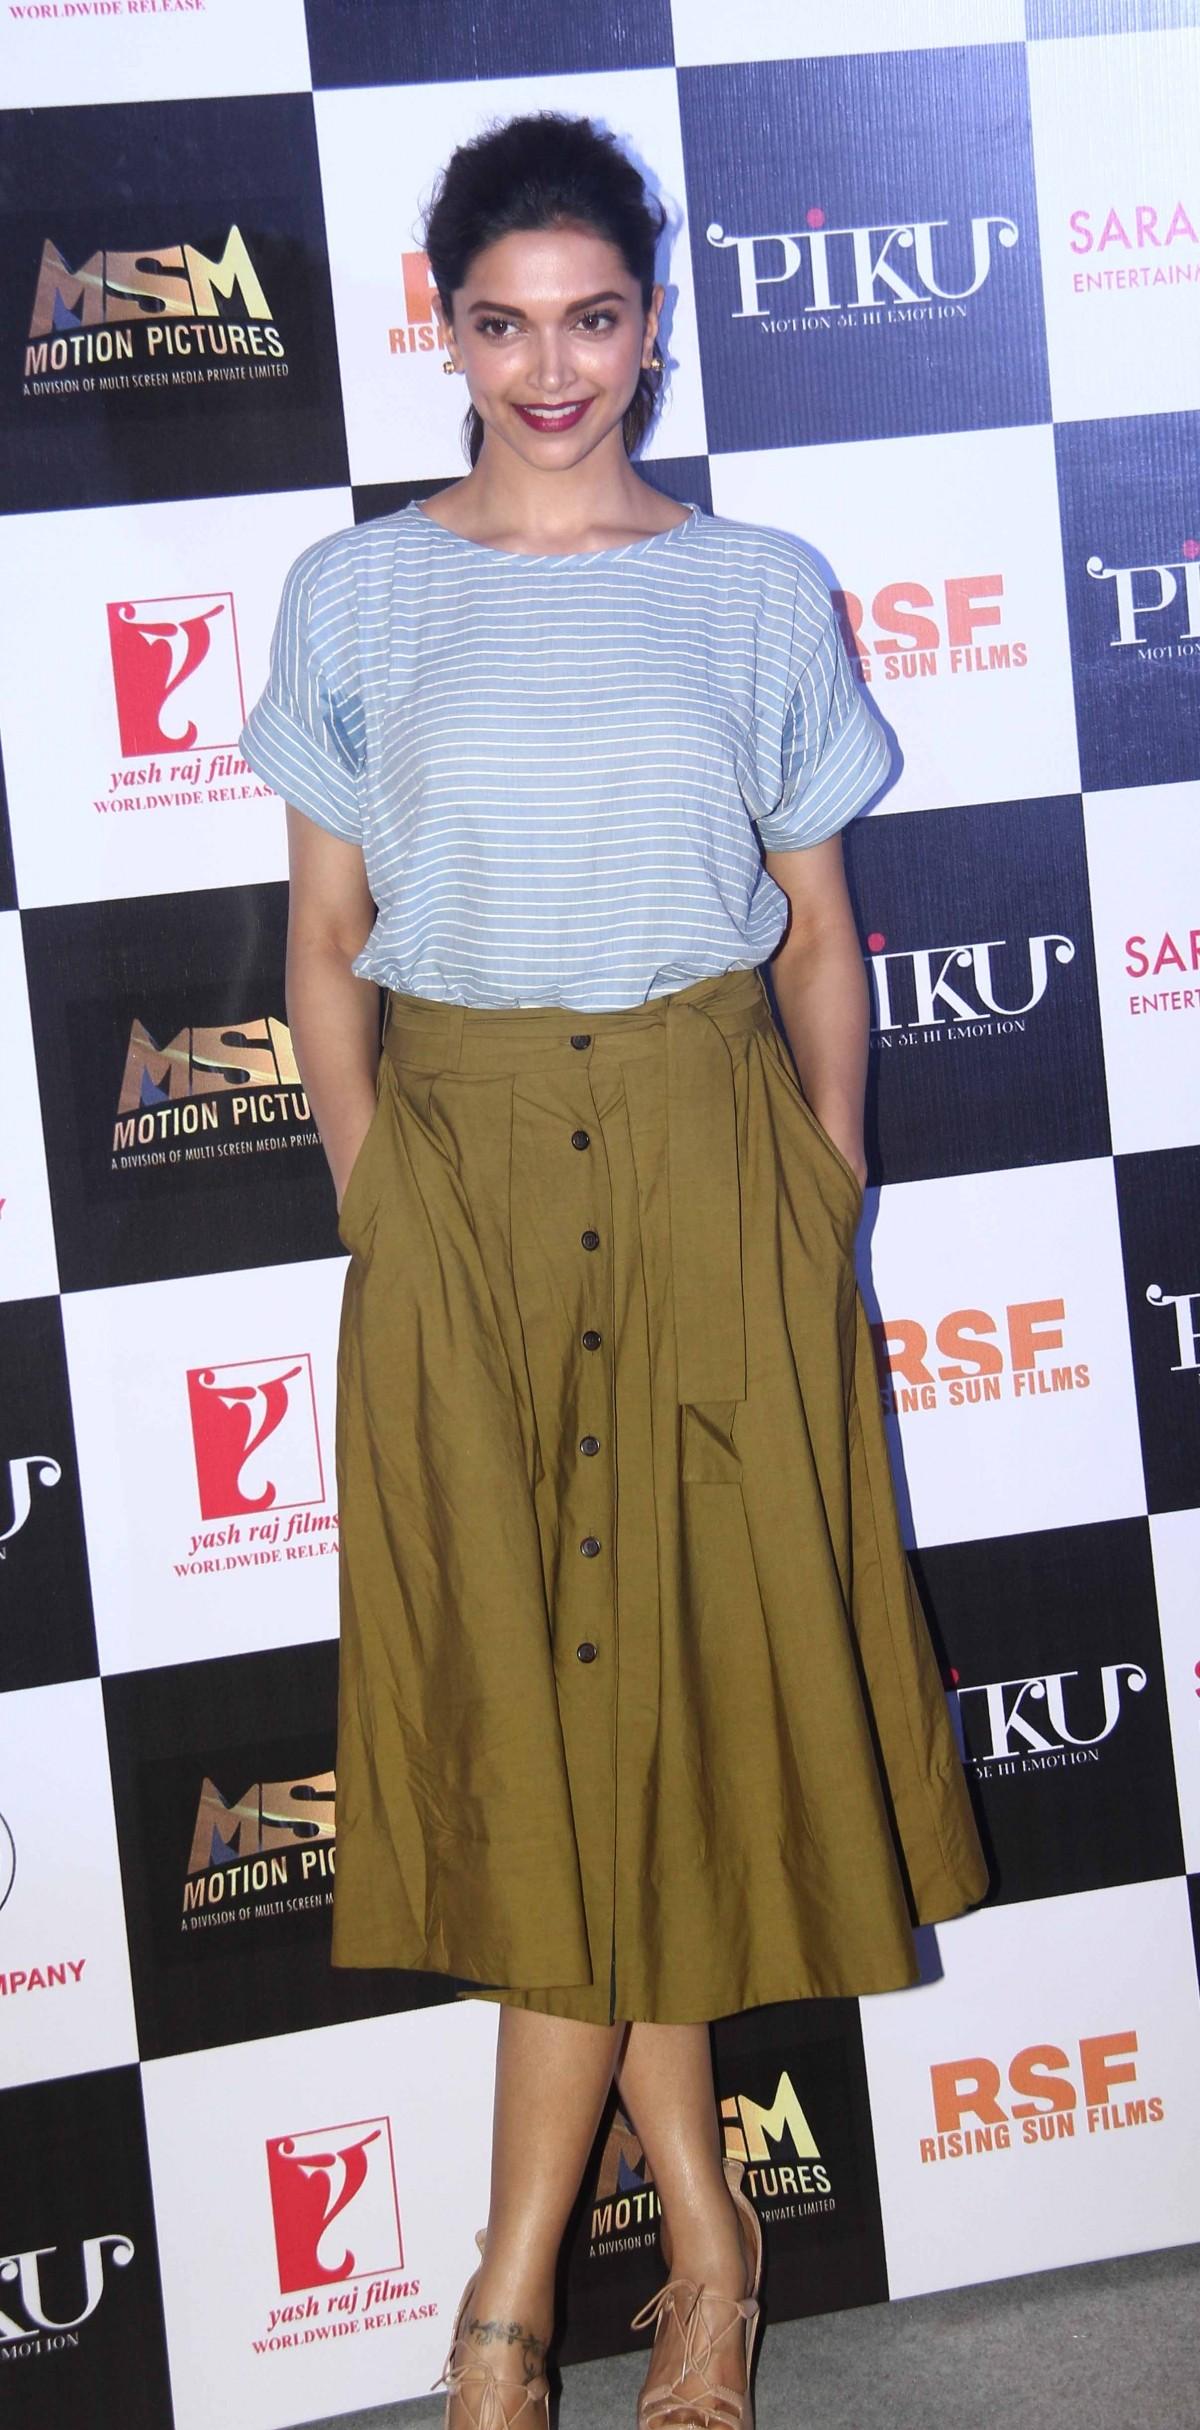 'Piku': Deepika Padukone, Amitabh Bachchan, Irrfan Khan Attend Trailer Launch